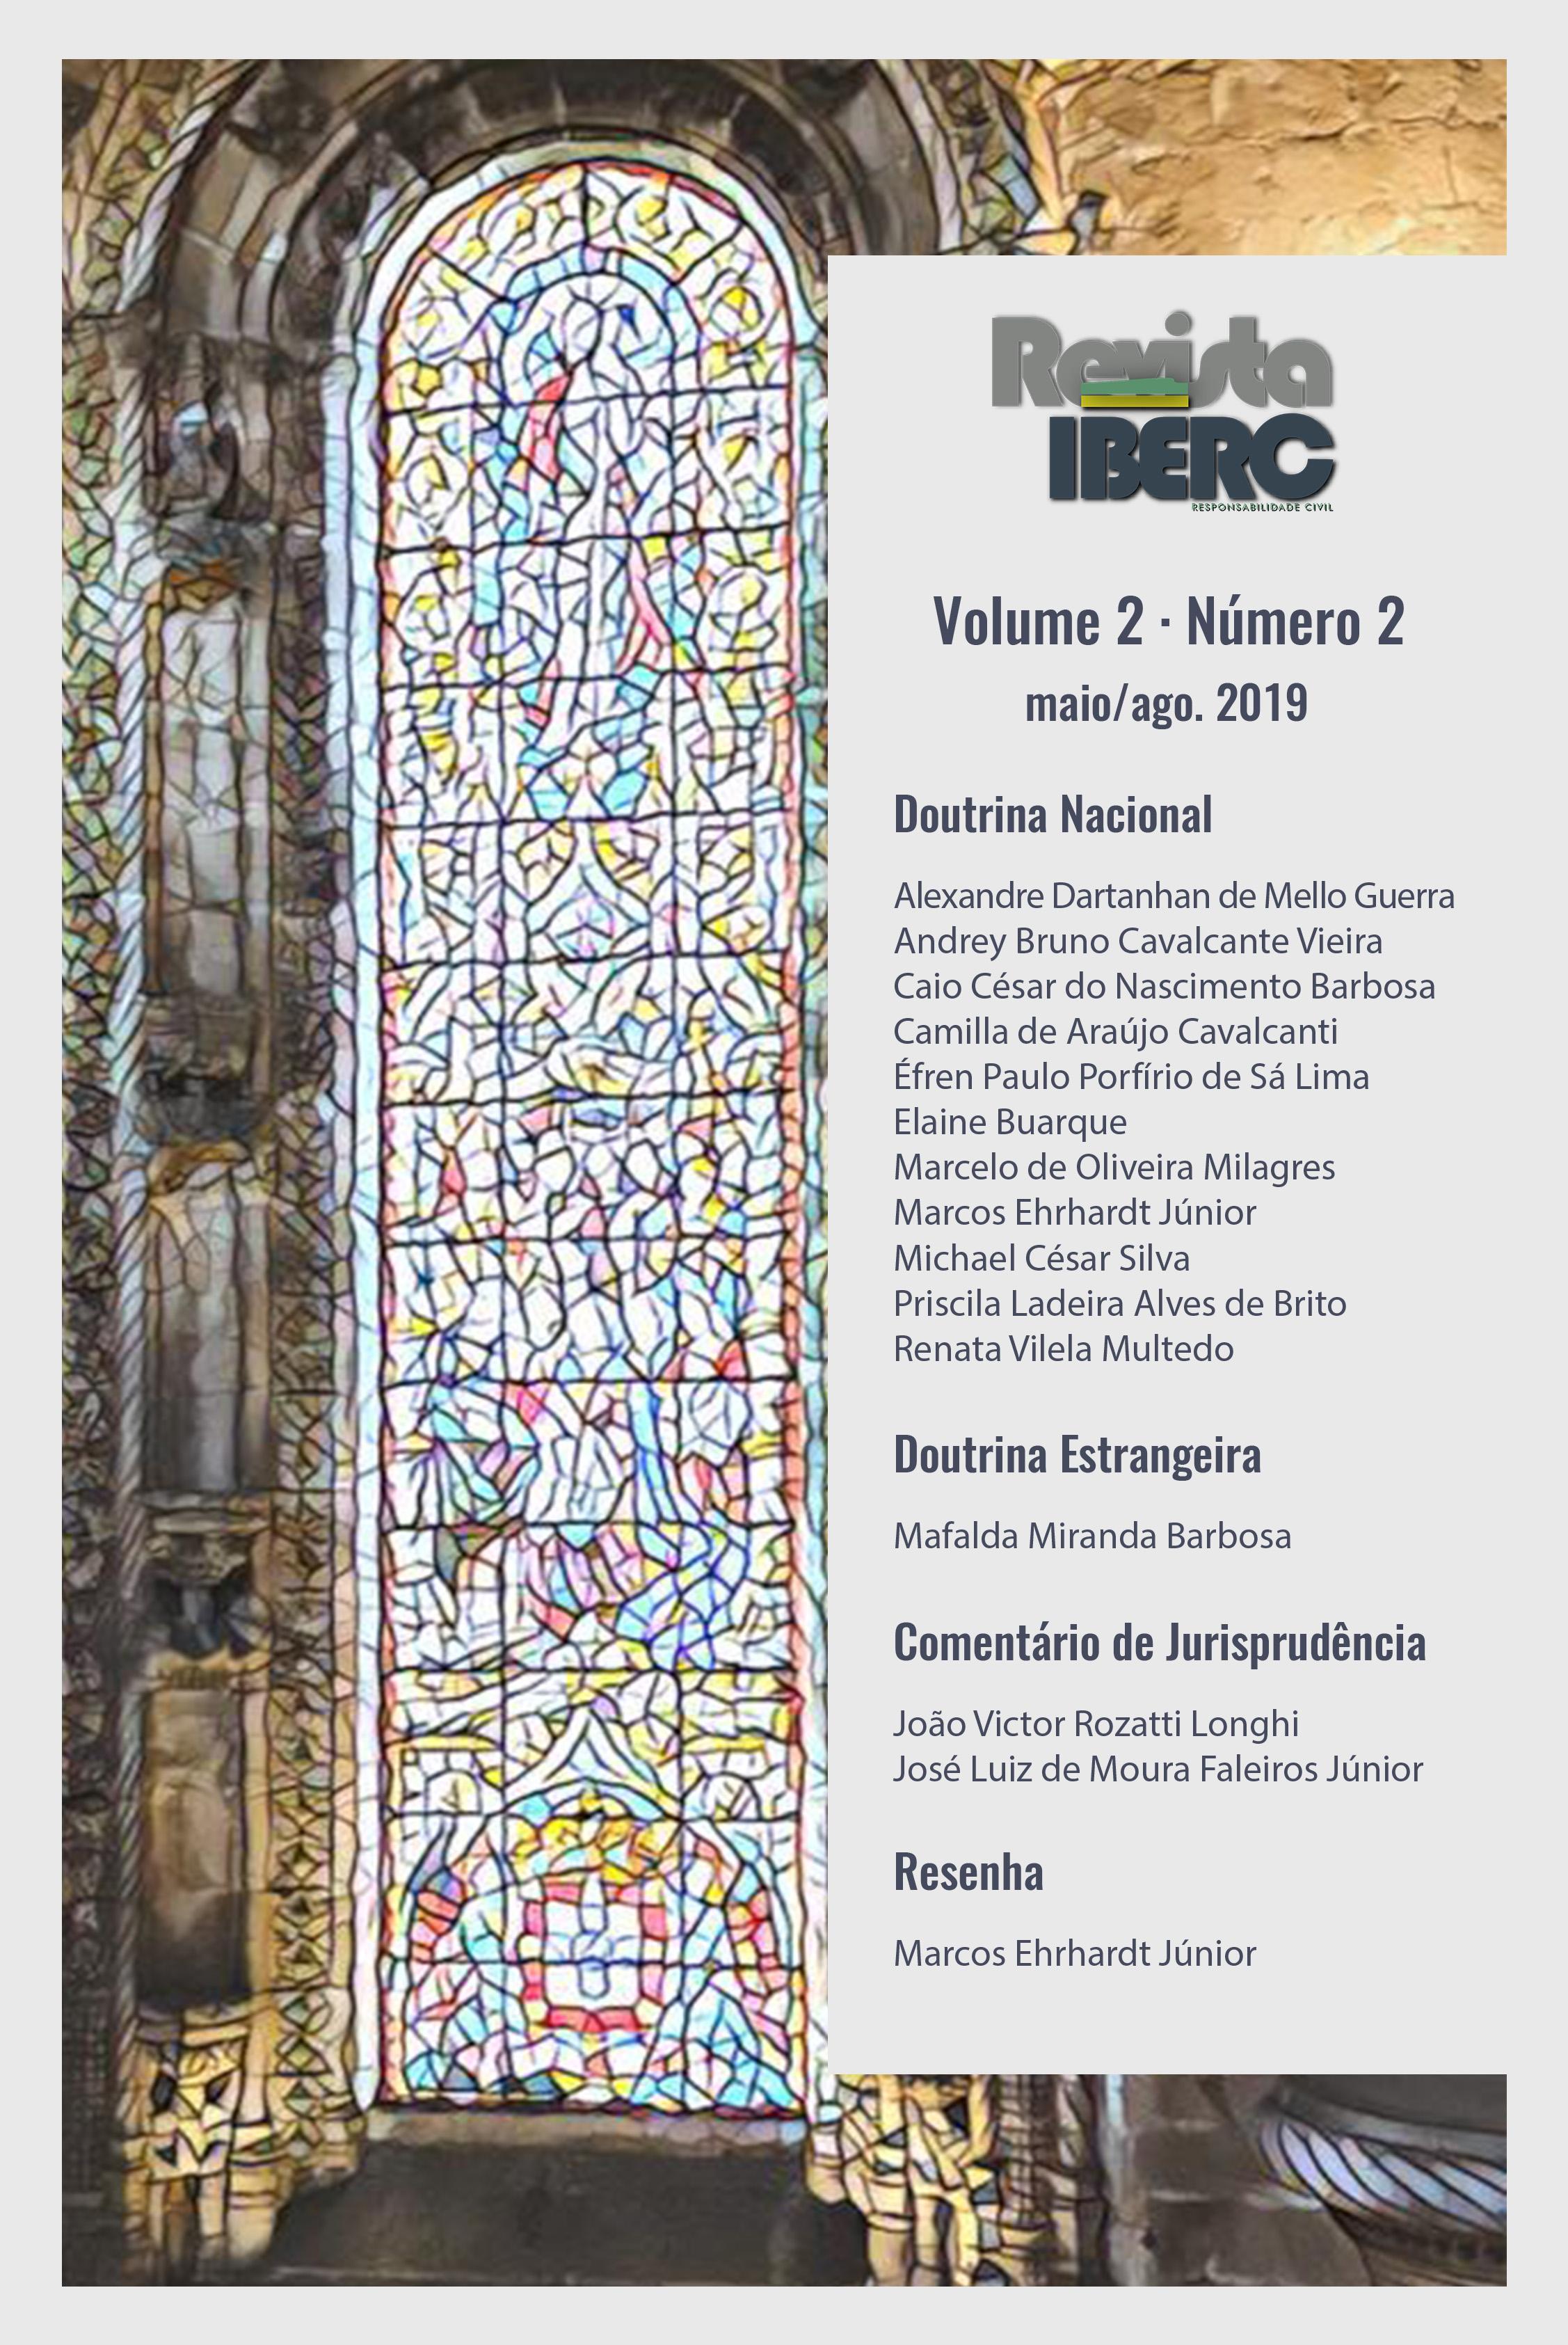 Capa da Revista IBERC - Volume 2 - Número 2